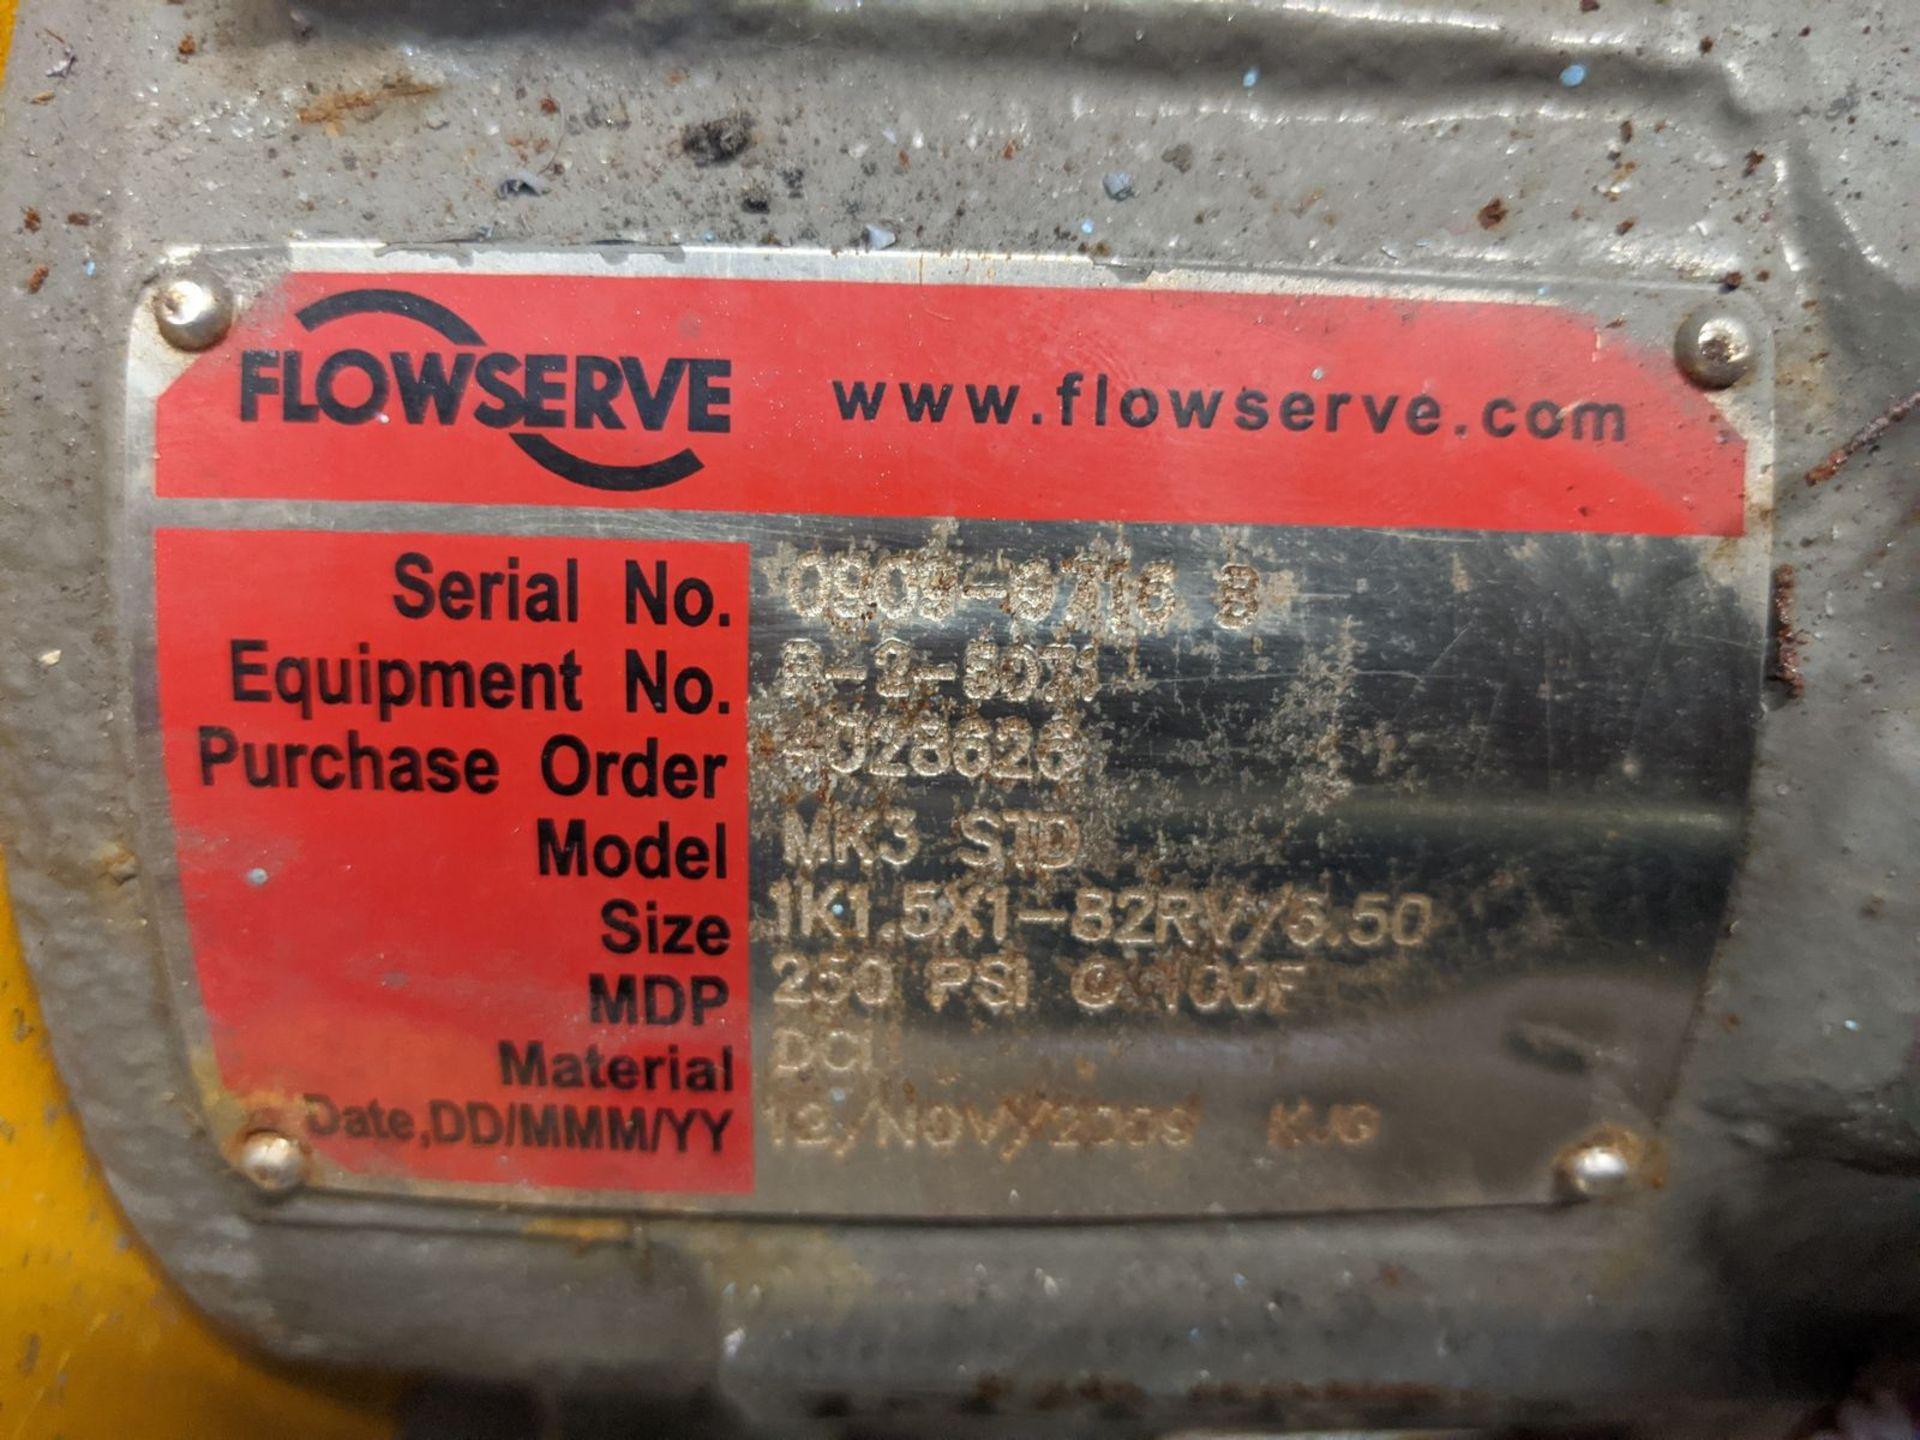 Flowserve Model MK3STD 10 HP Centrifugal Pump - Image 2 of 3